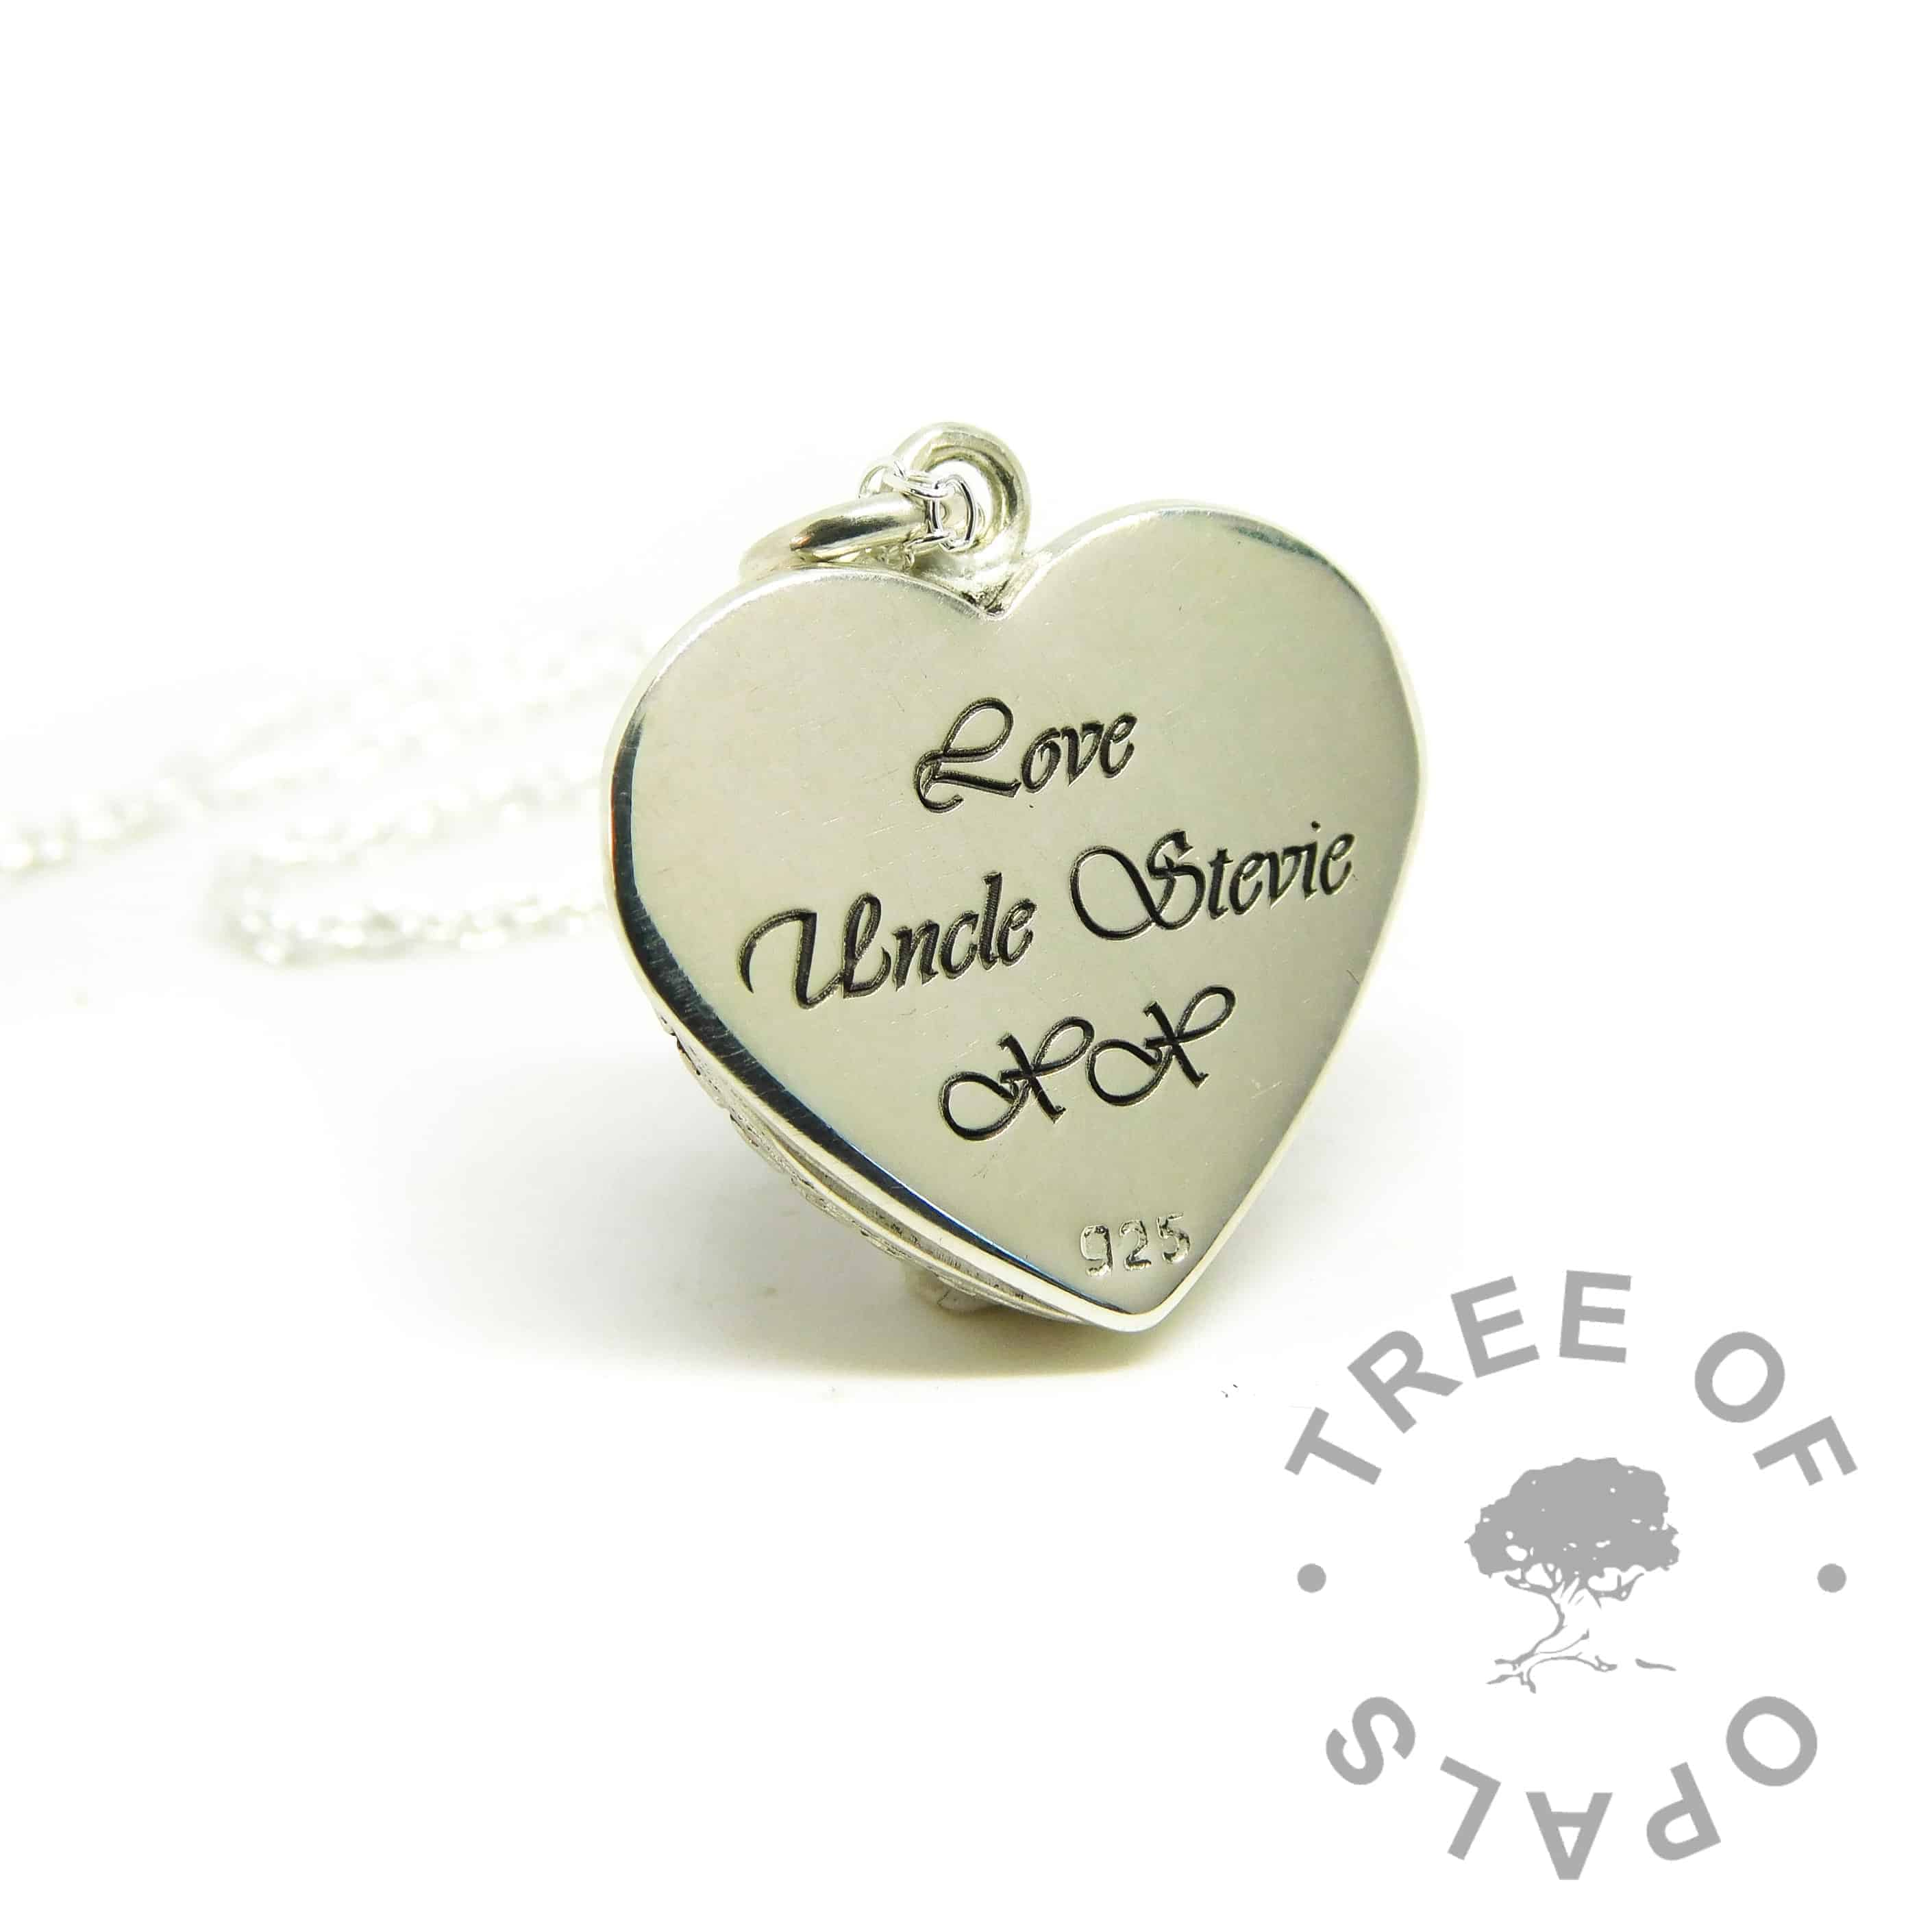 engraved heart necklace, engraved in Vivaldi font